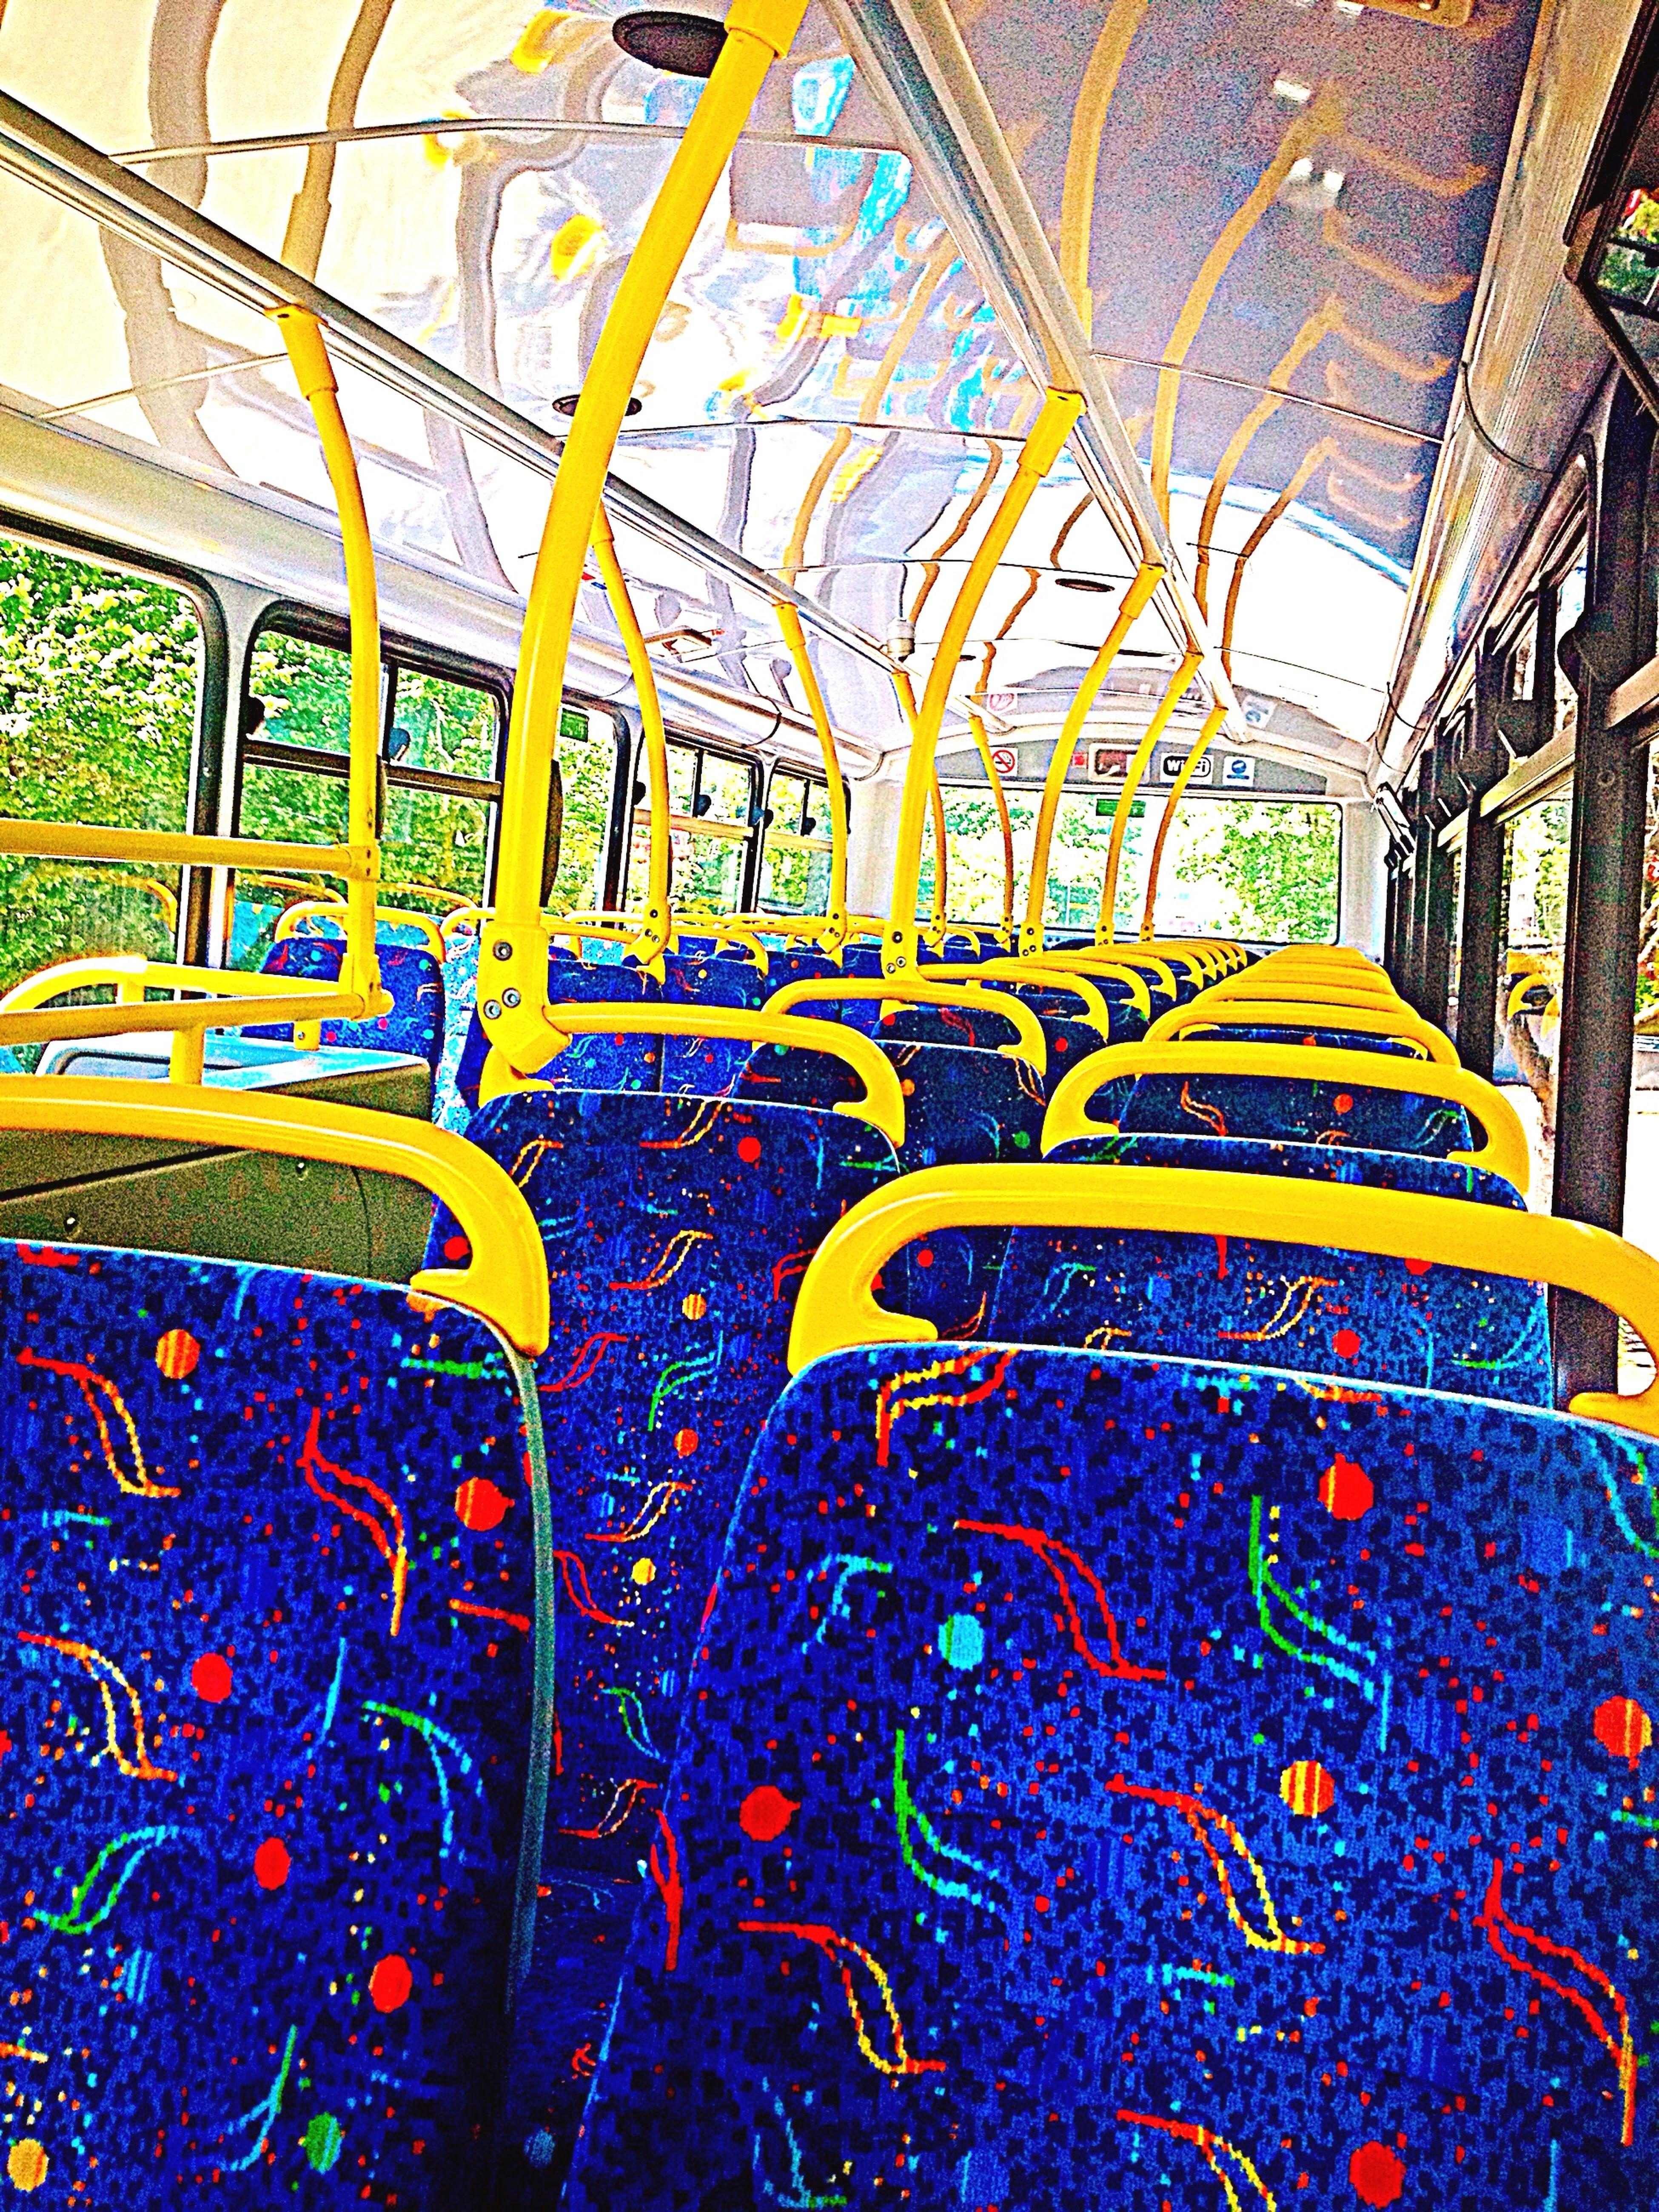 Bus Empty Colourful Bright Irish🍀 Seats Pattern Alone Peace Quiet